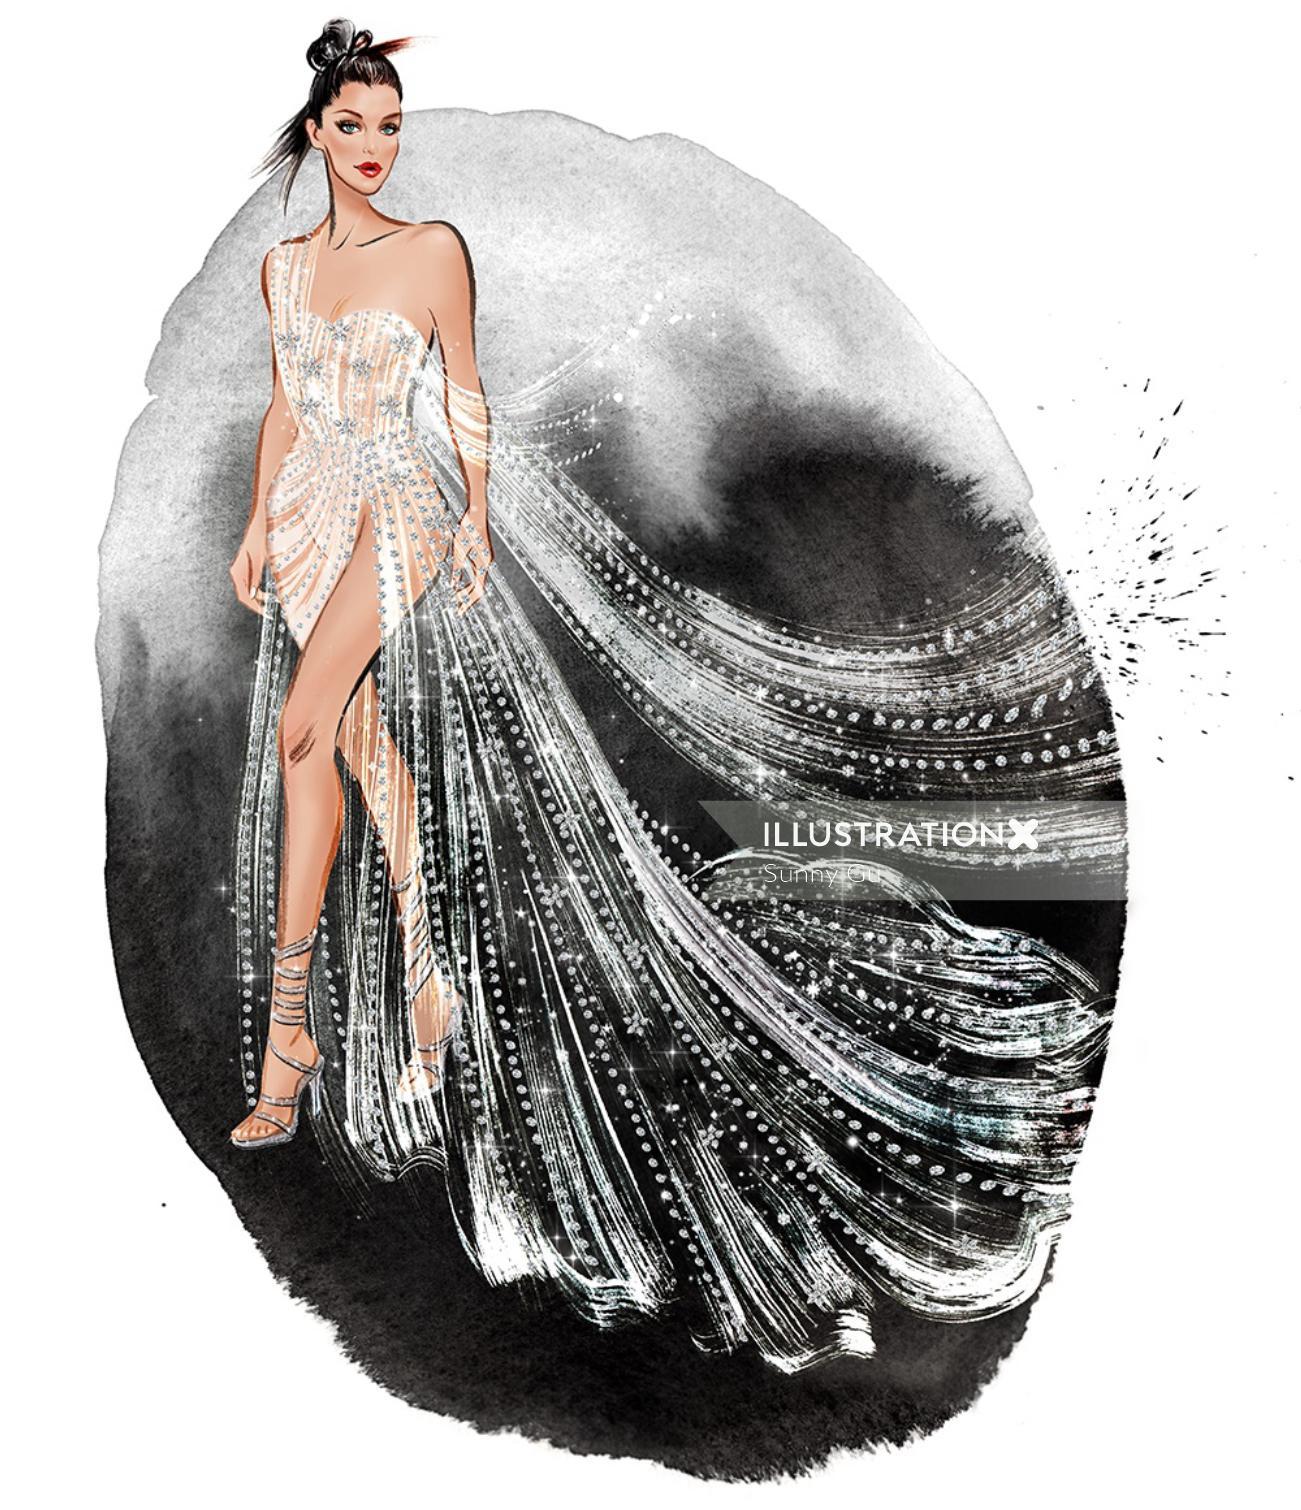 Fantasy girl wearing silver dress  mixed media illustration